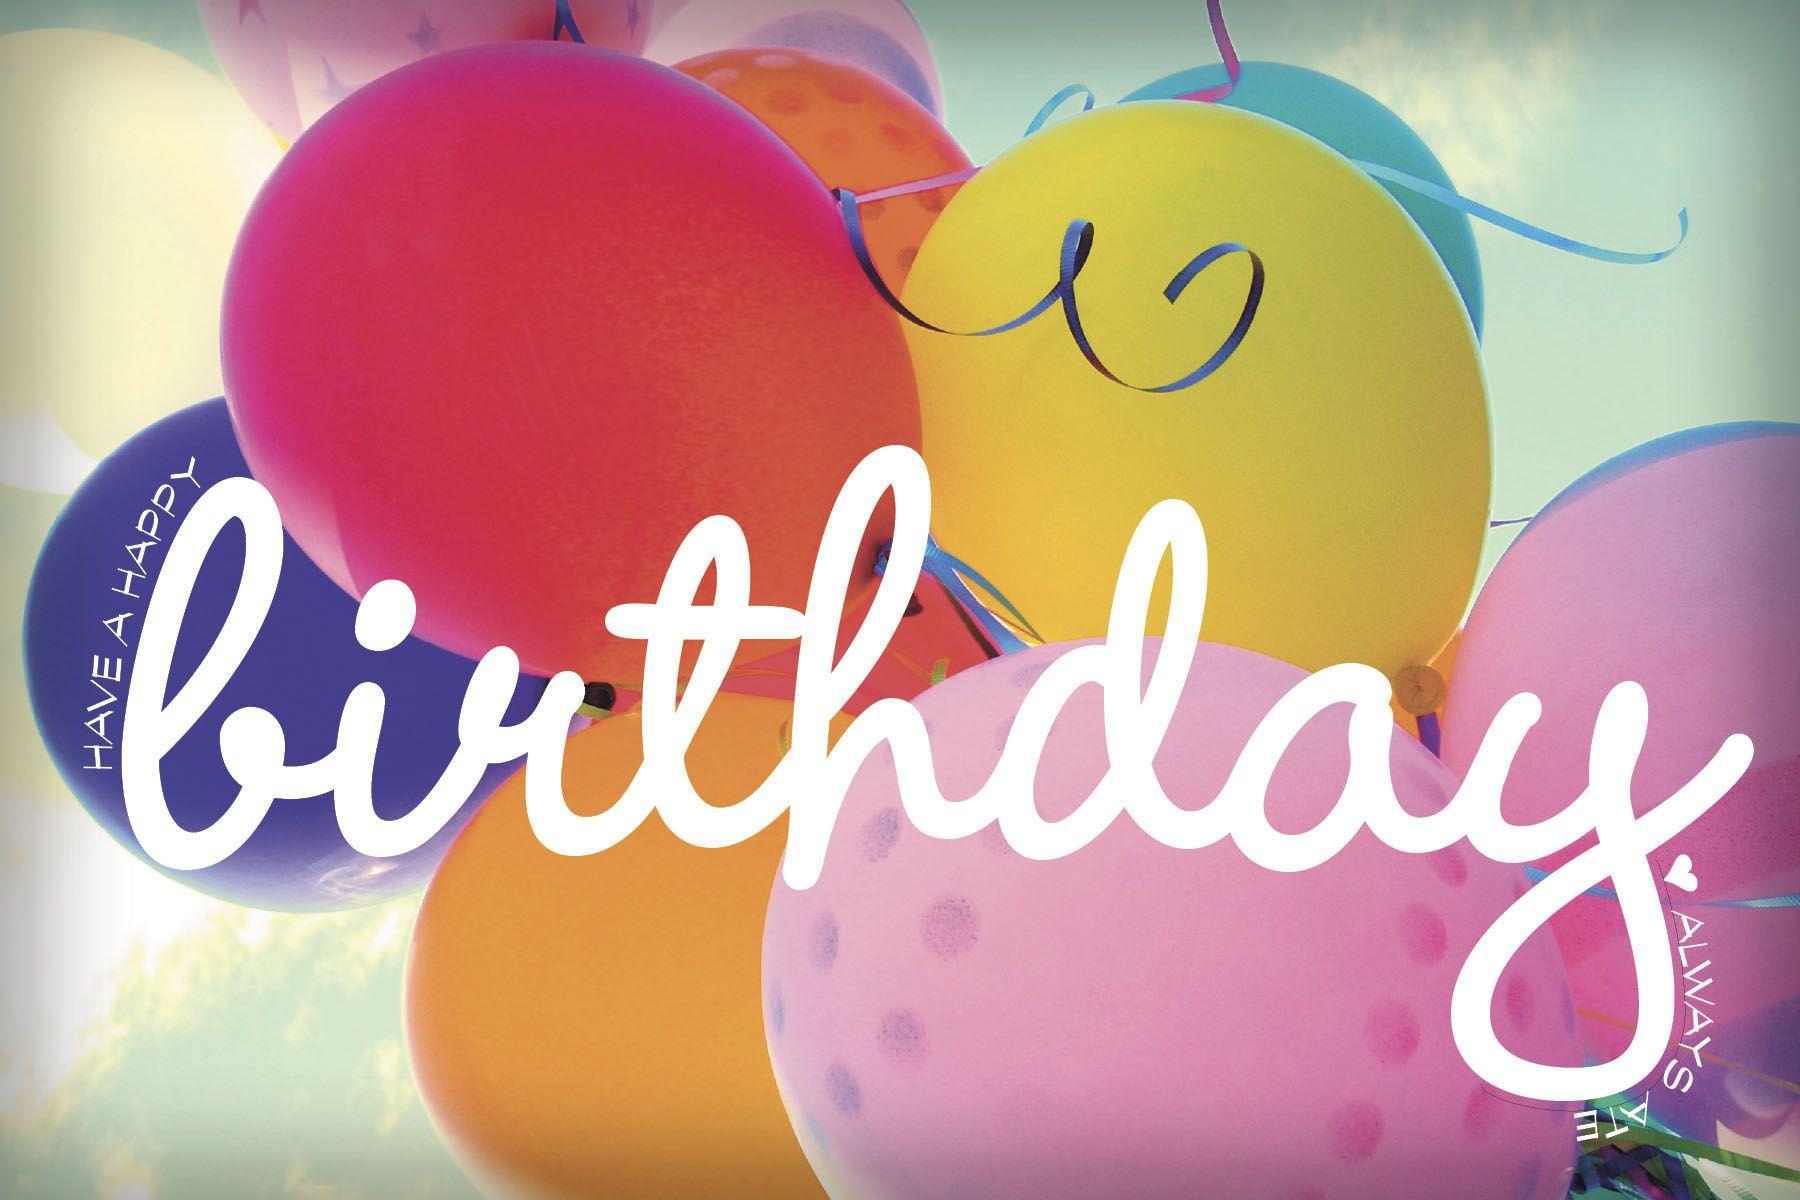 Birthday Wish Boyfriend U2013 Birthdayimages.info